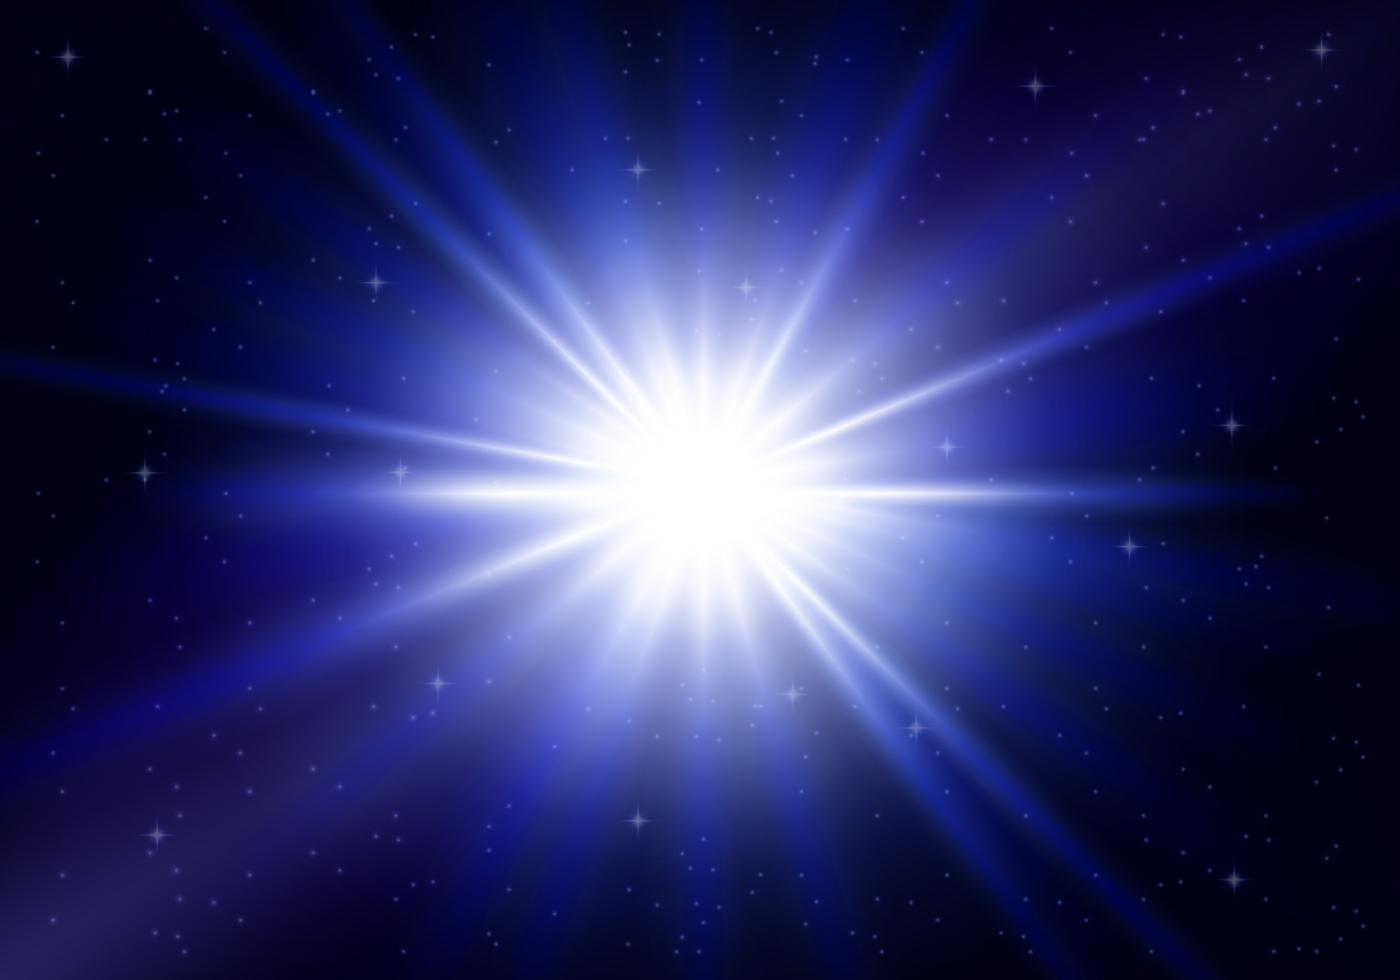 venn diagram of stars and planets supernova explosion download free vector art stock